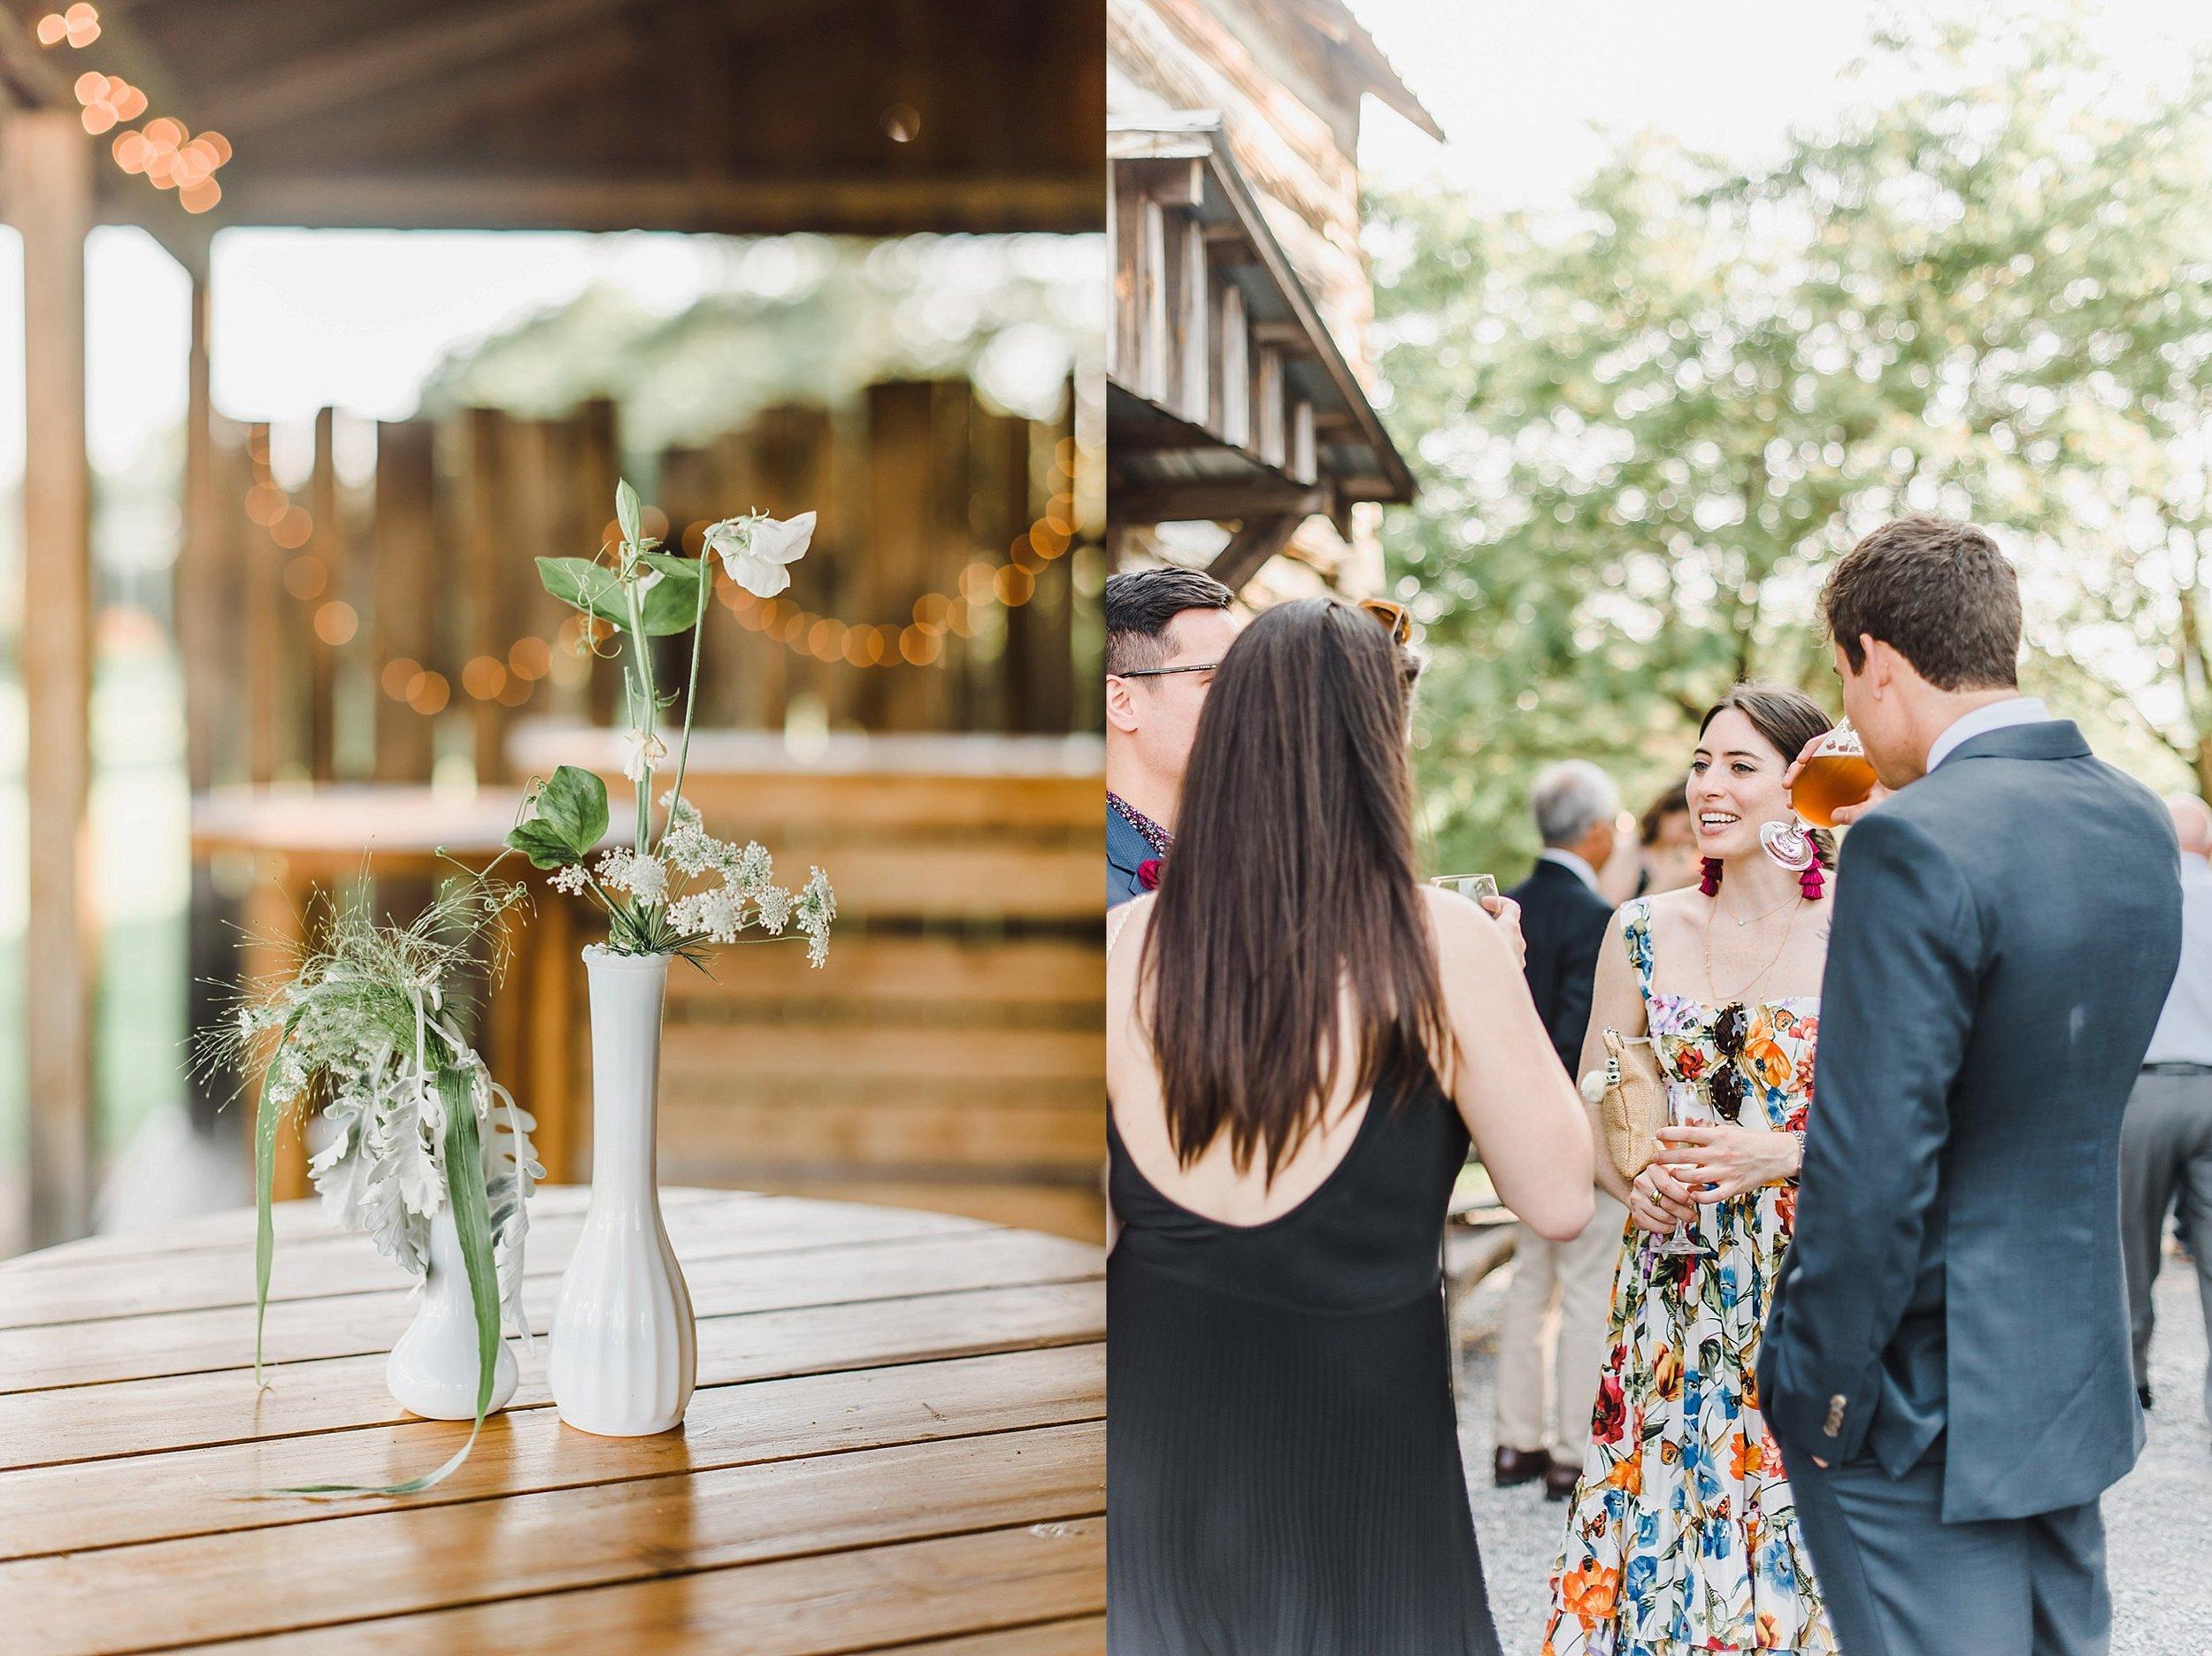 light airy indie fine art ottawa wedding photographer | Ali and Batoul Photography_0890.jpg